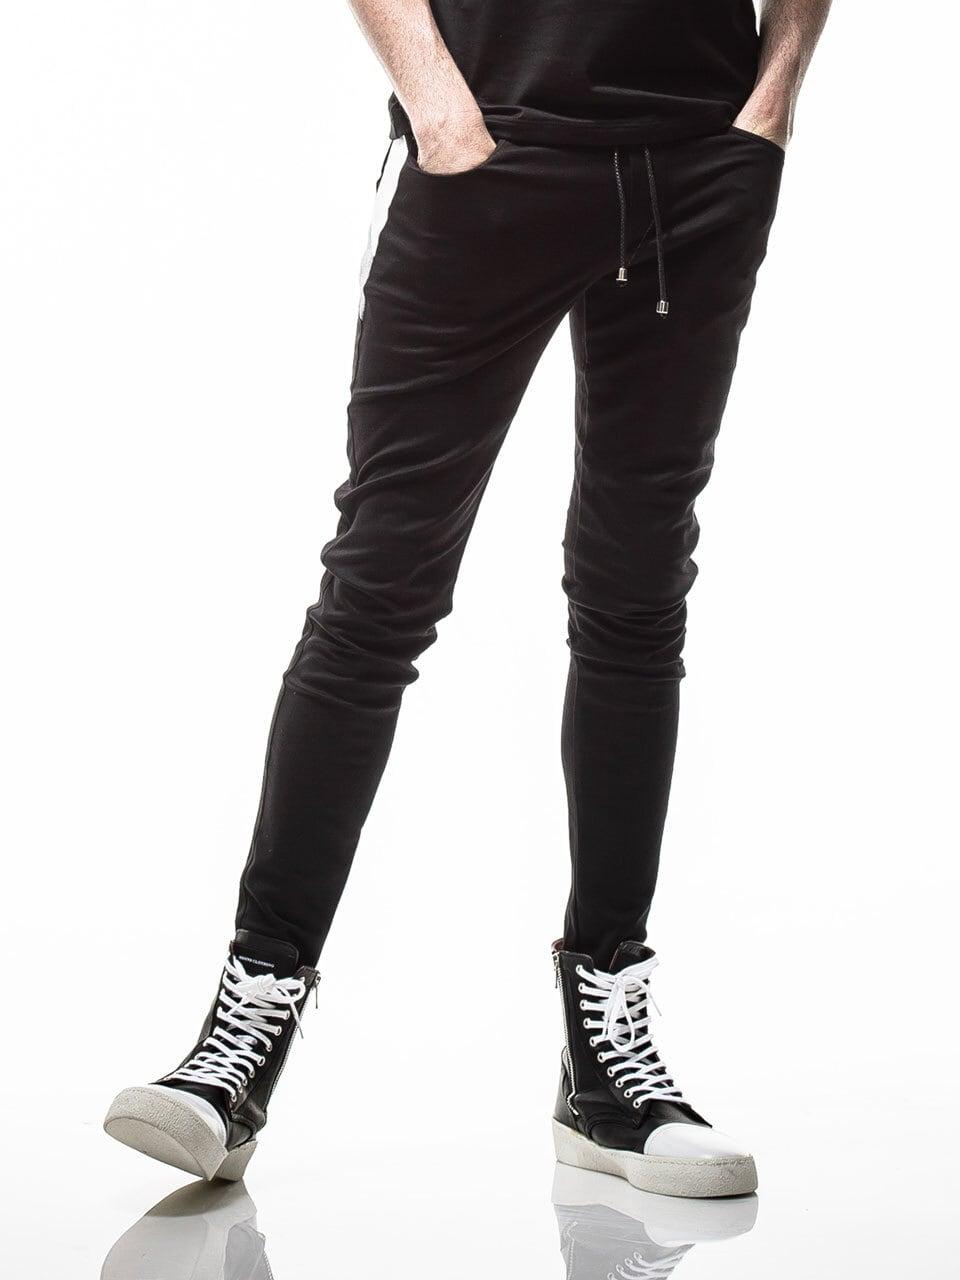 RESOUND CLOTHING (リサウンドクロージング) EDWARD LINE PT / BKGREY RC19-ST-011-1